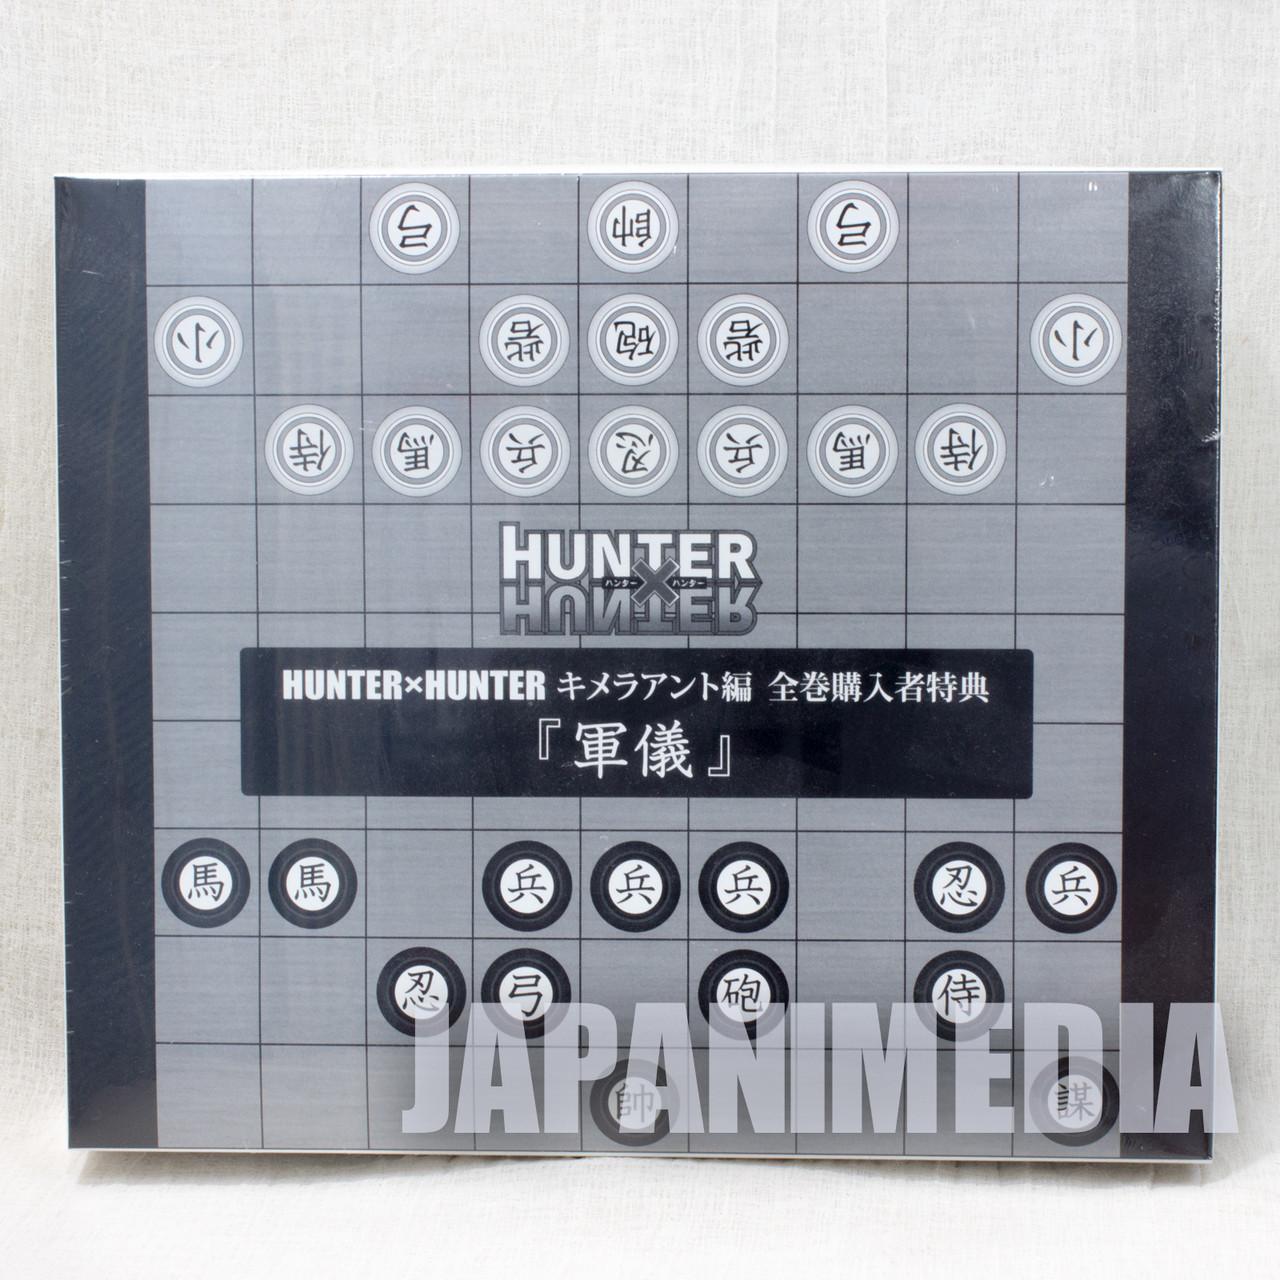 Rare Hunter X Hunter Gungi Board Game Of Chimera Ant Japan Anime Manga Japanimedia Store Use custom templates to tell the right story for your business. rare hunter x hunter gungi board game of chimera ant japan anime manga